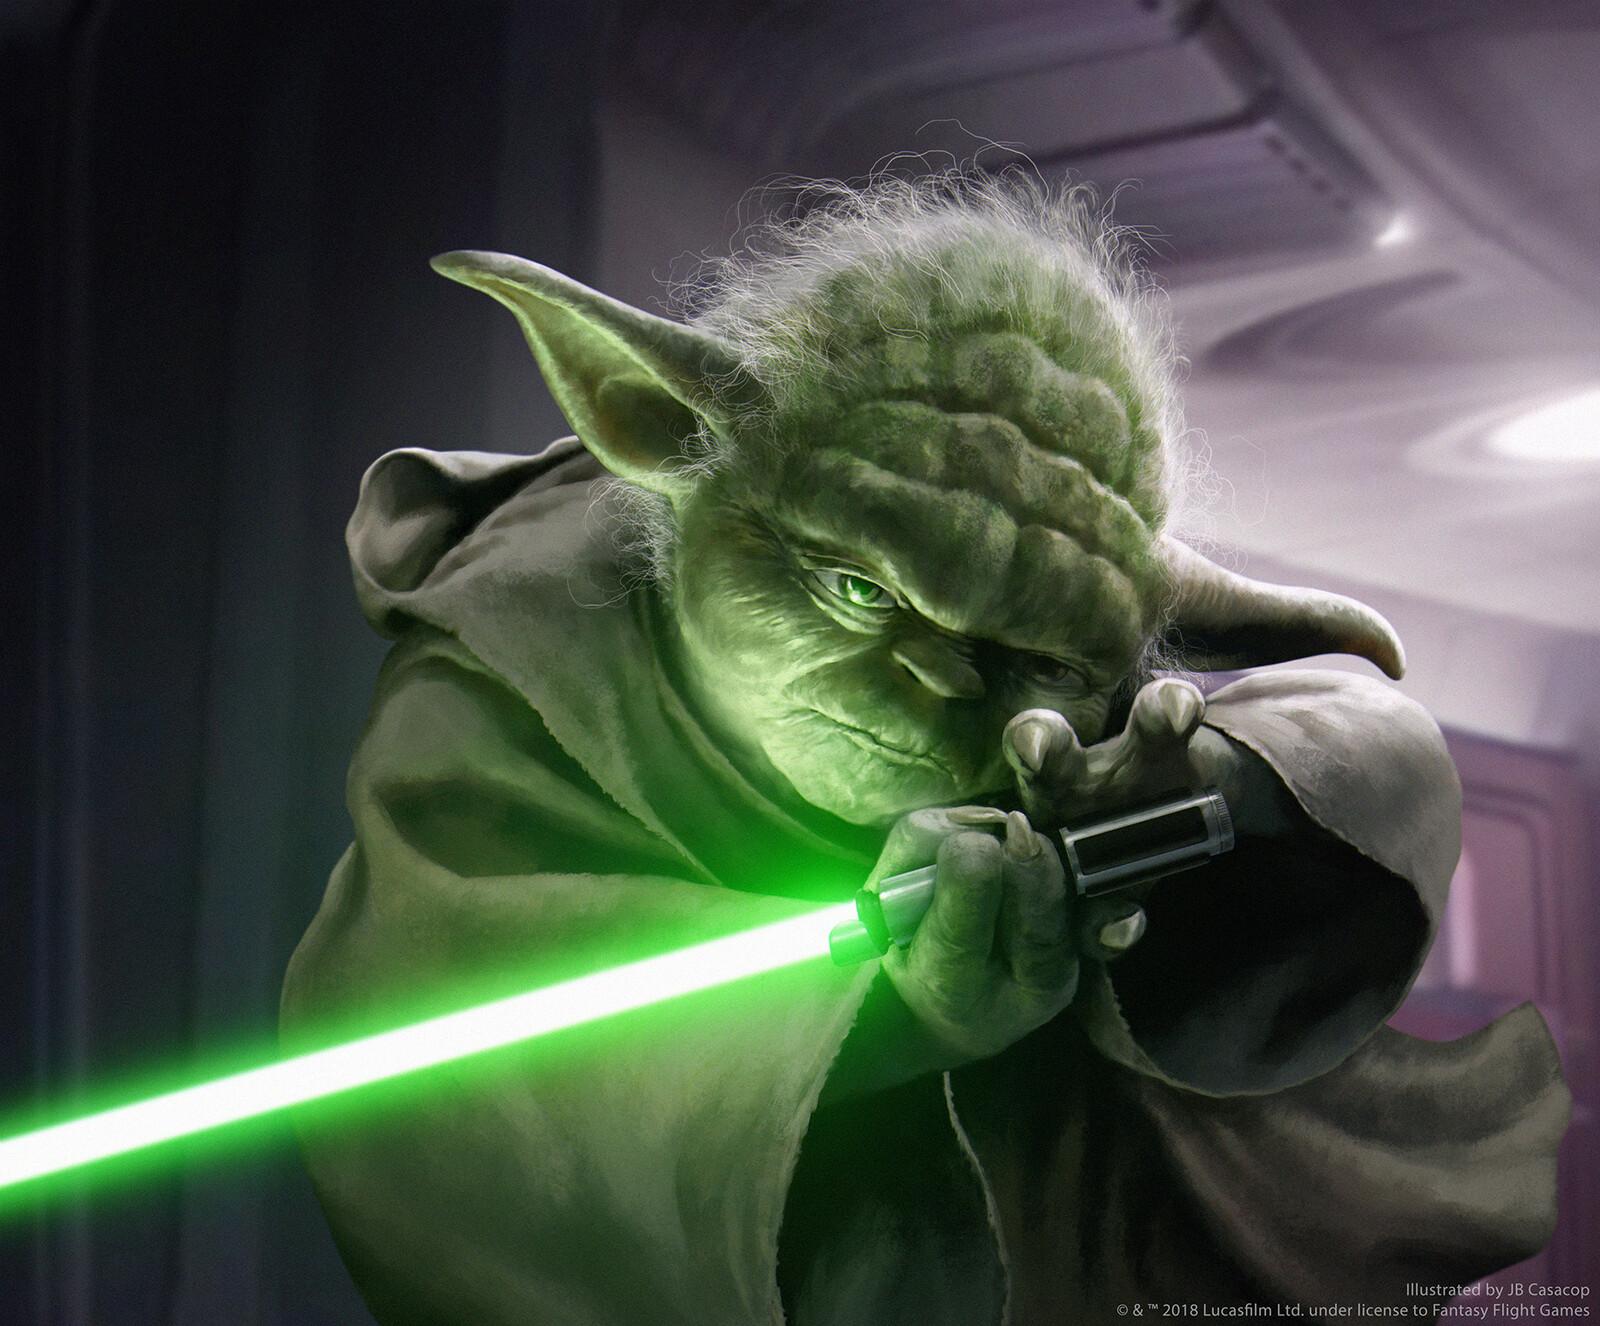 Yoda's Lightsaber